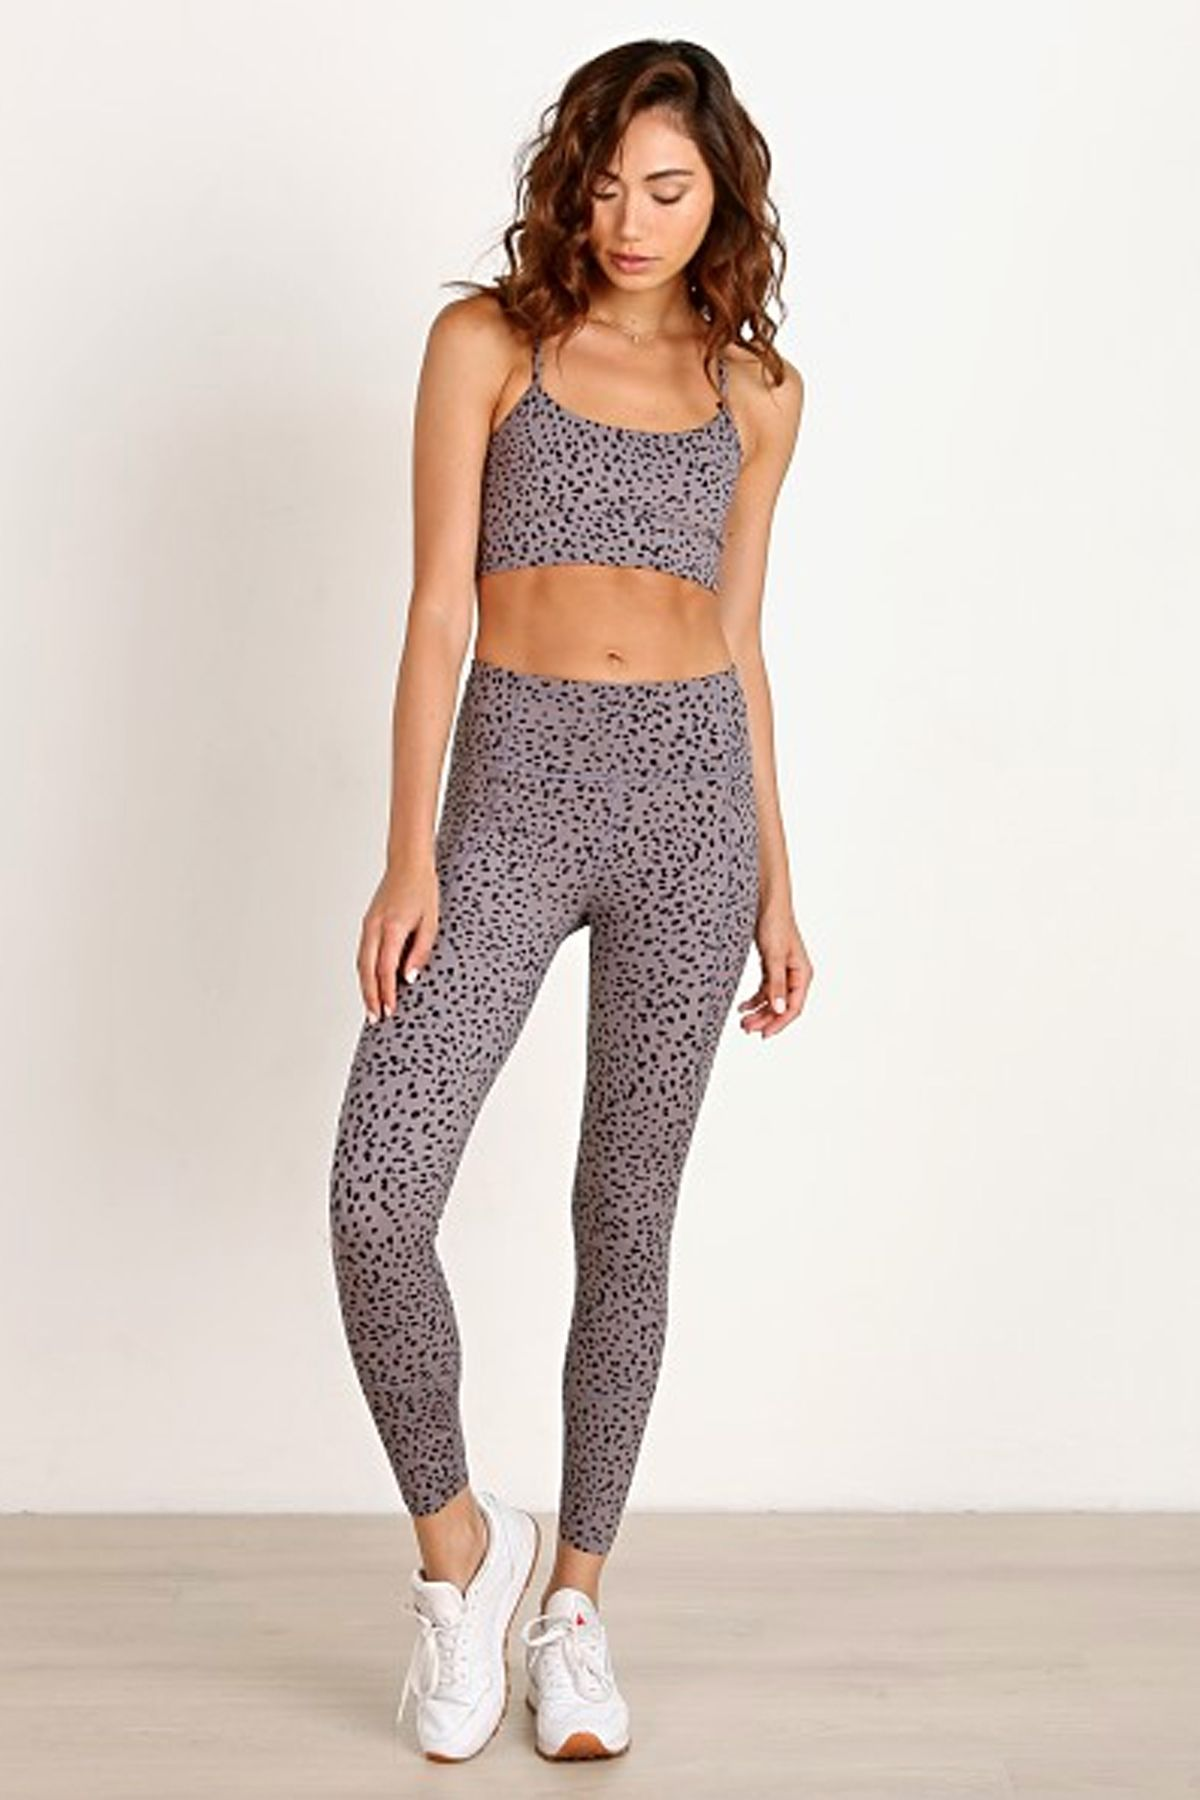 b5565bea084c Varley feliz sports bra and bedford leggings, speckled print activewear,  workout clothes, leopard print workout clothes, labor day sale